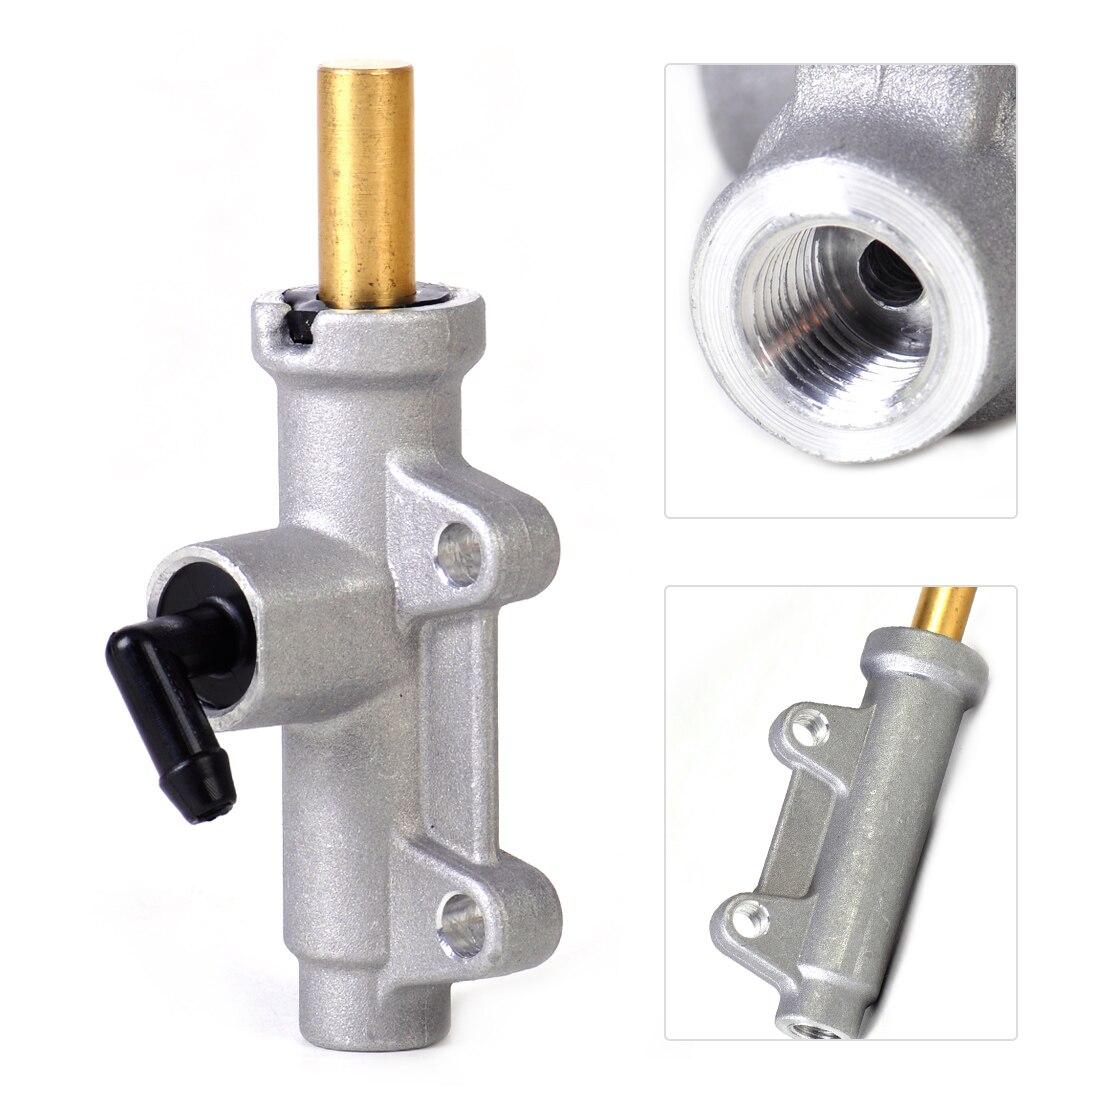 For Polaris Sportsman Rear Brake Master Cylinder335 400 450 500 600 Worker ATV